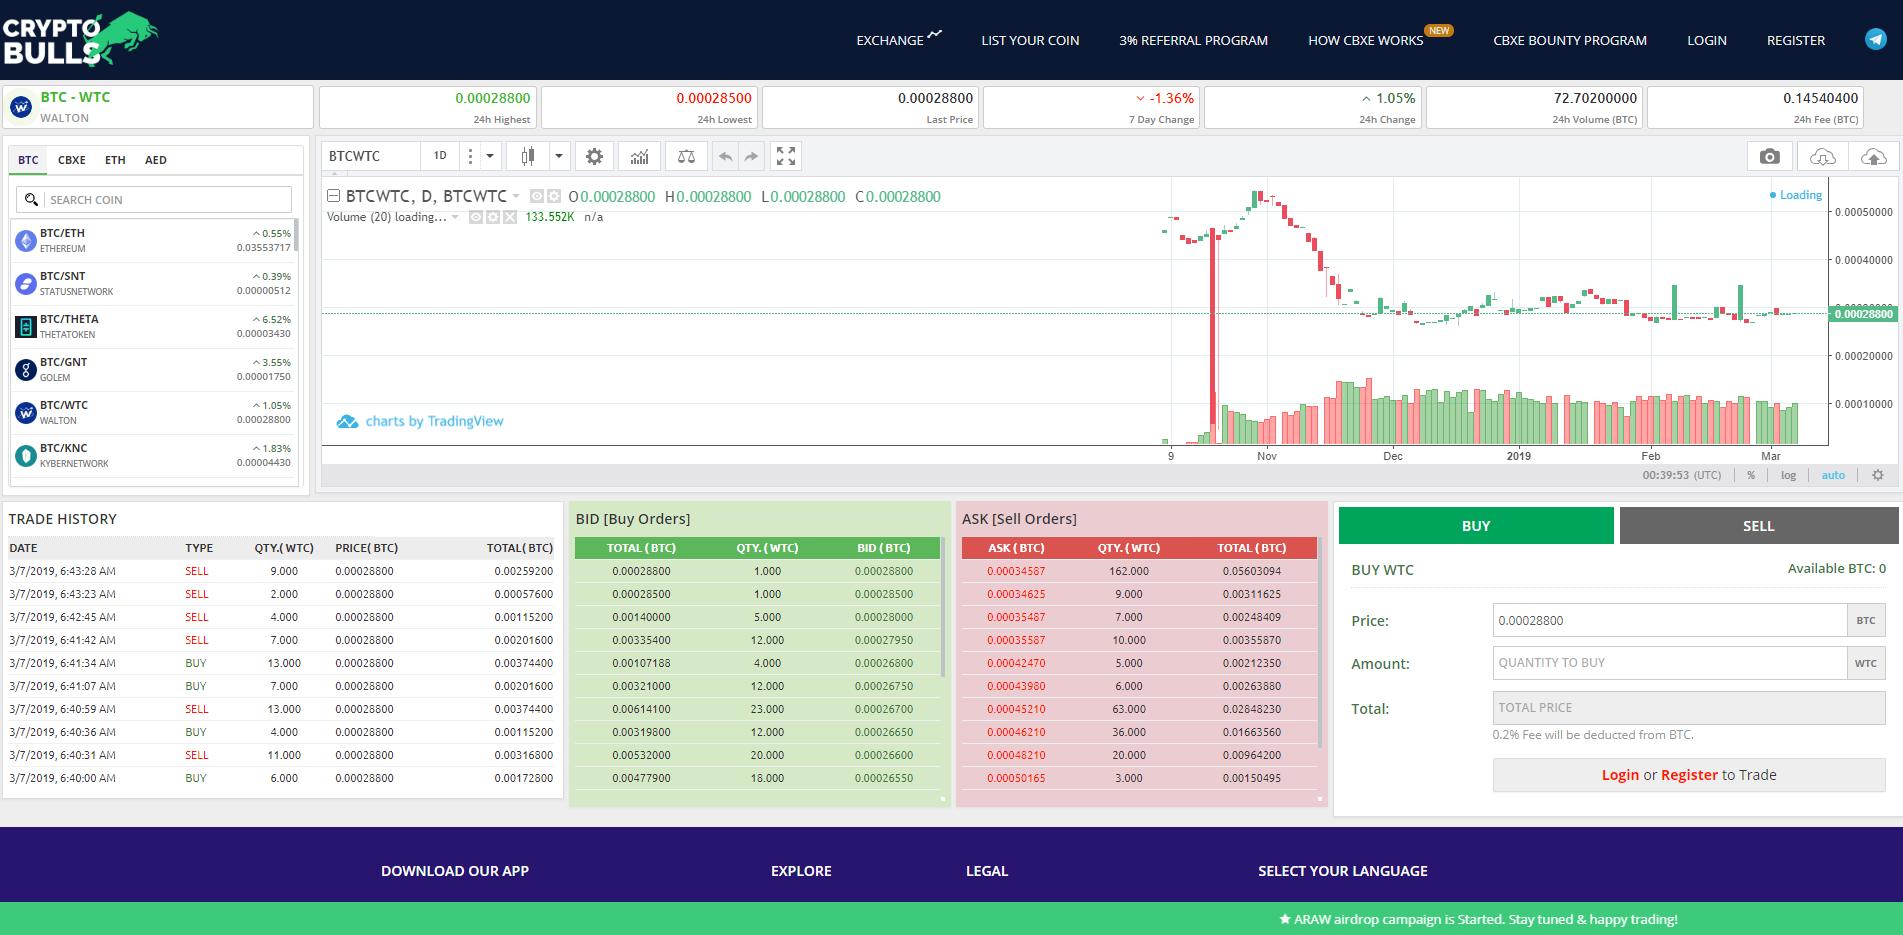 Cryptobulls Trading View